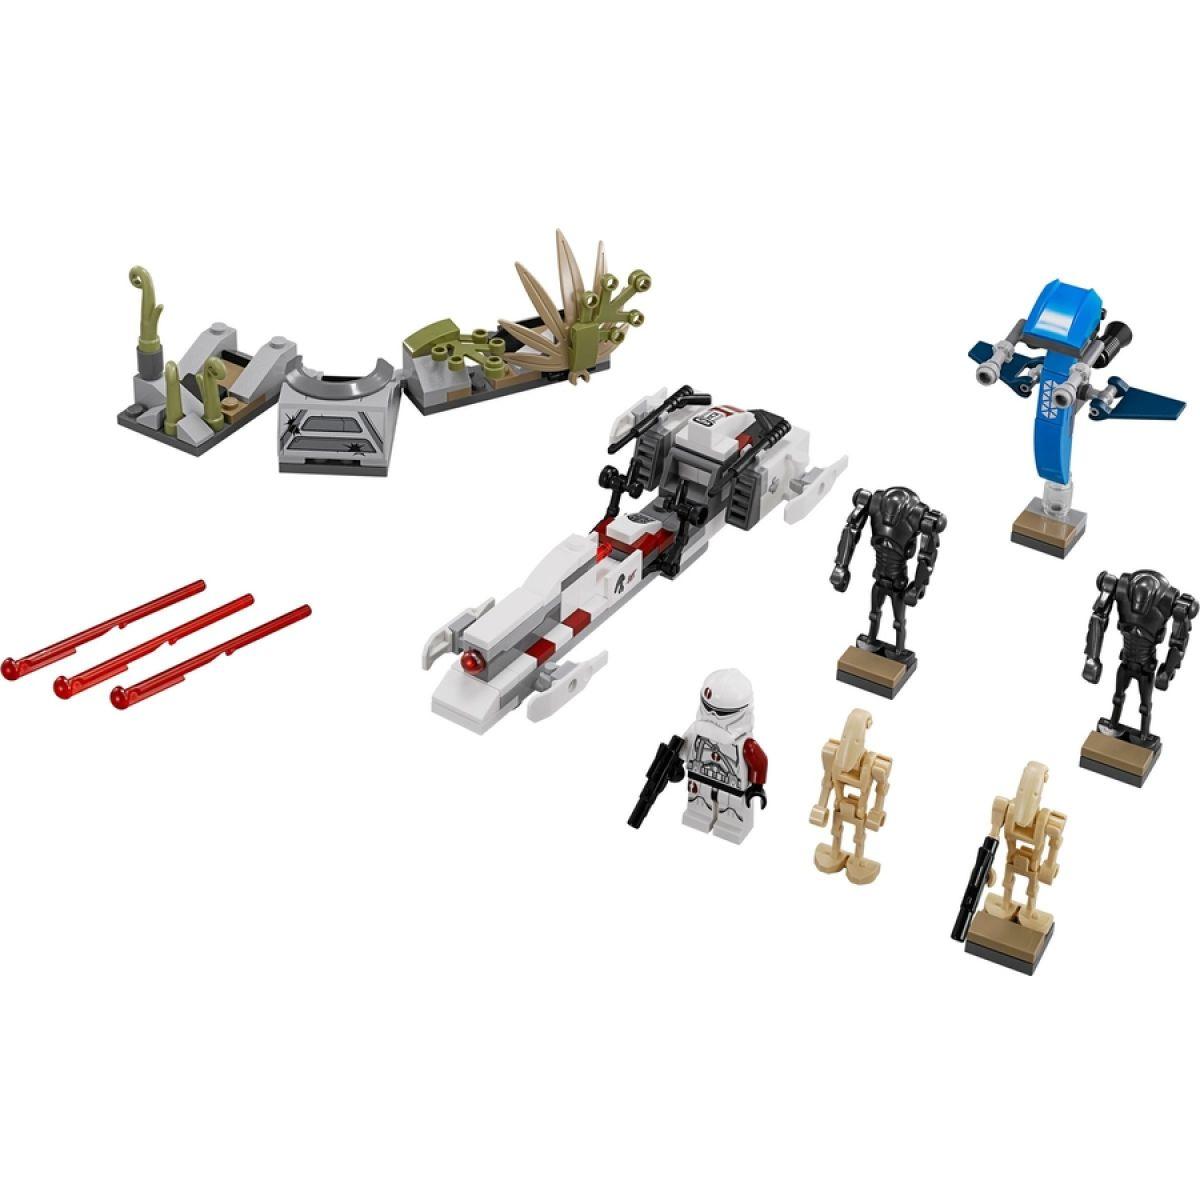 LEGO Star Wars 75037 Battle on Saleucami #2